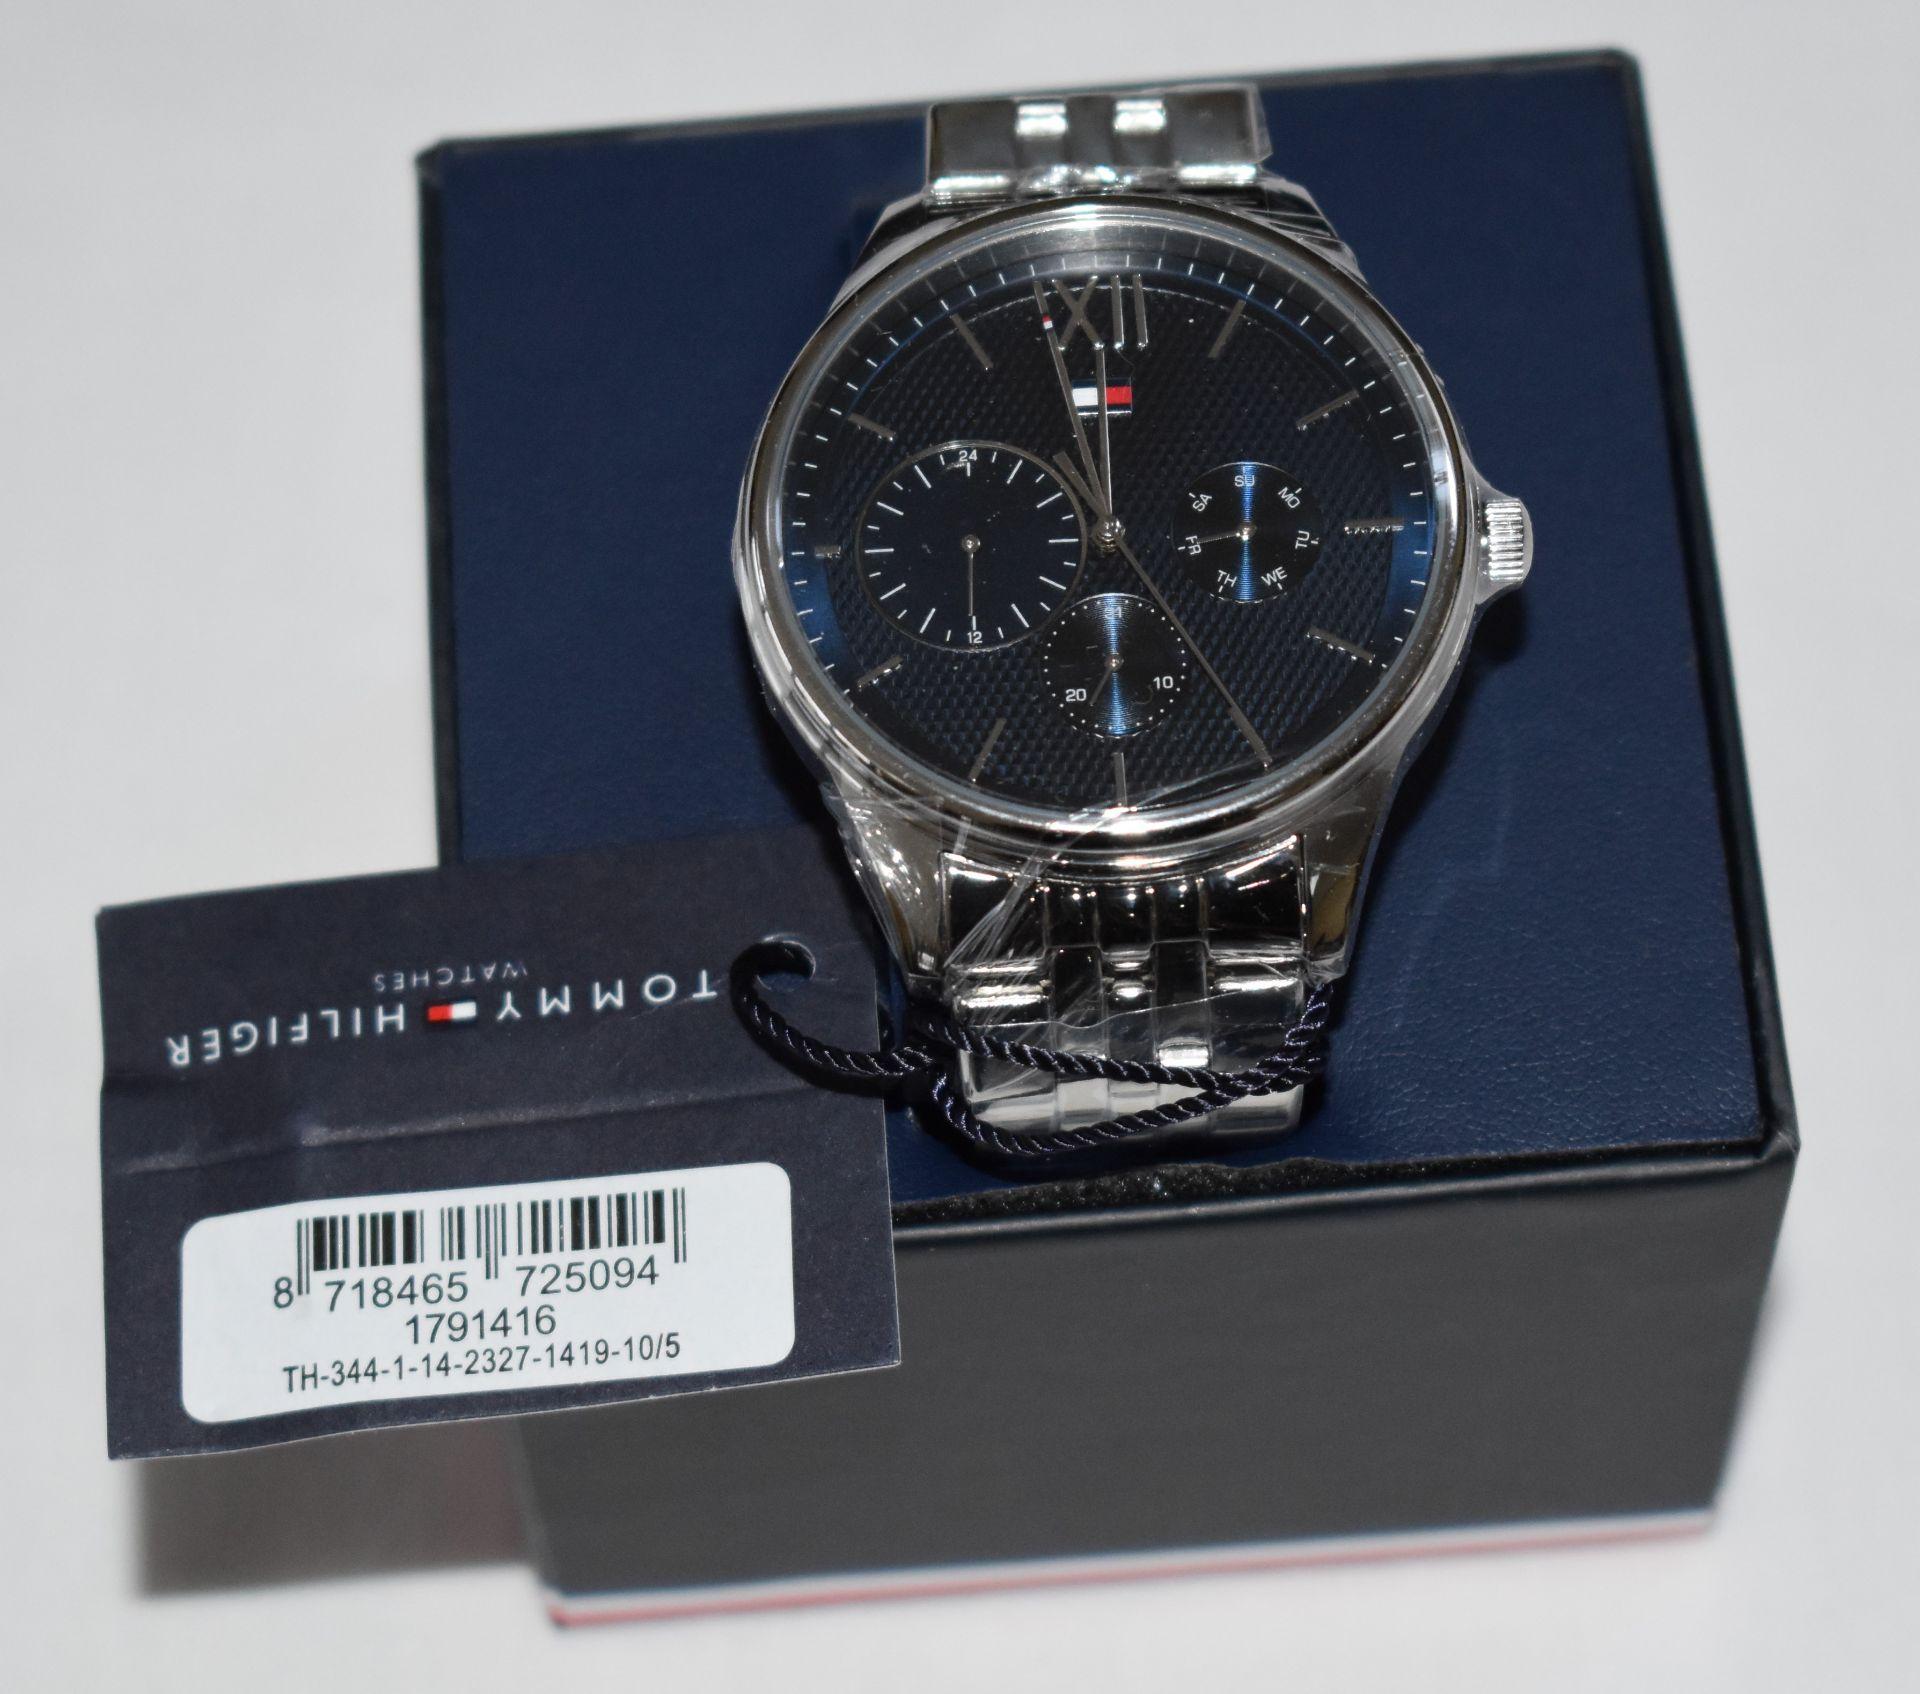 Tommy Hilfiger Men's Watch 1791416 - Image 2 of 2